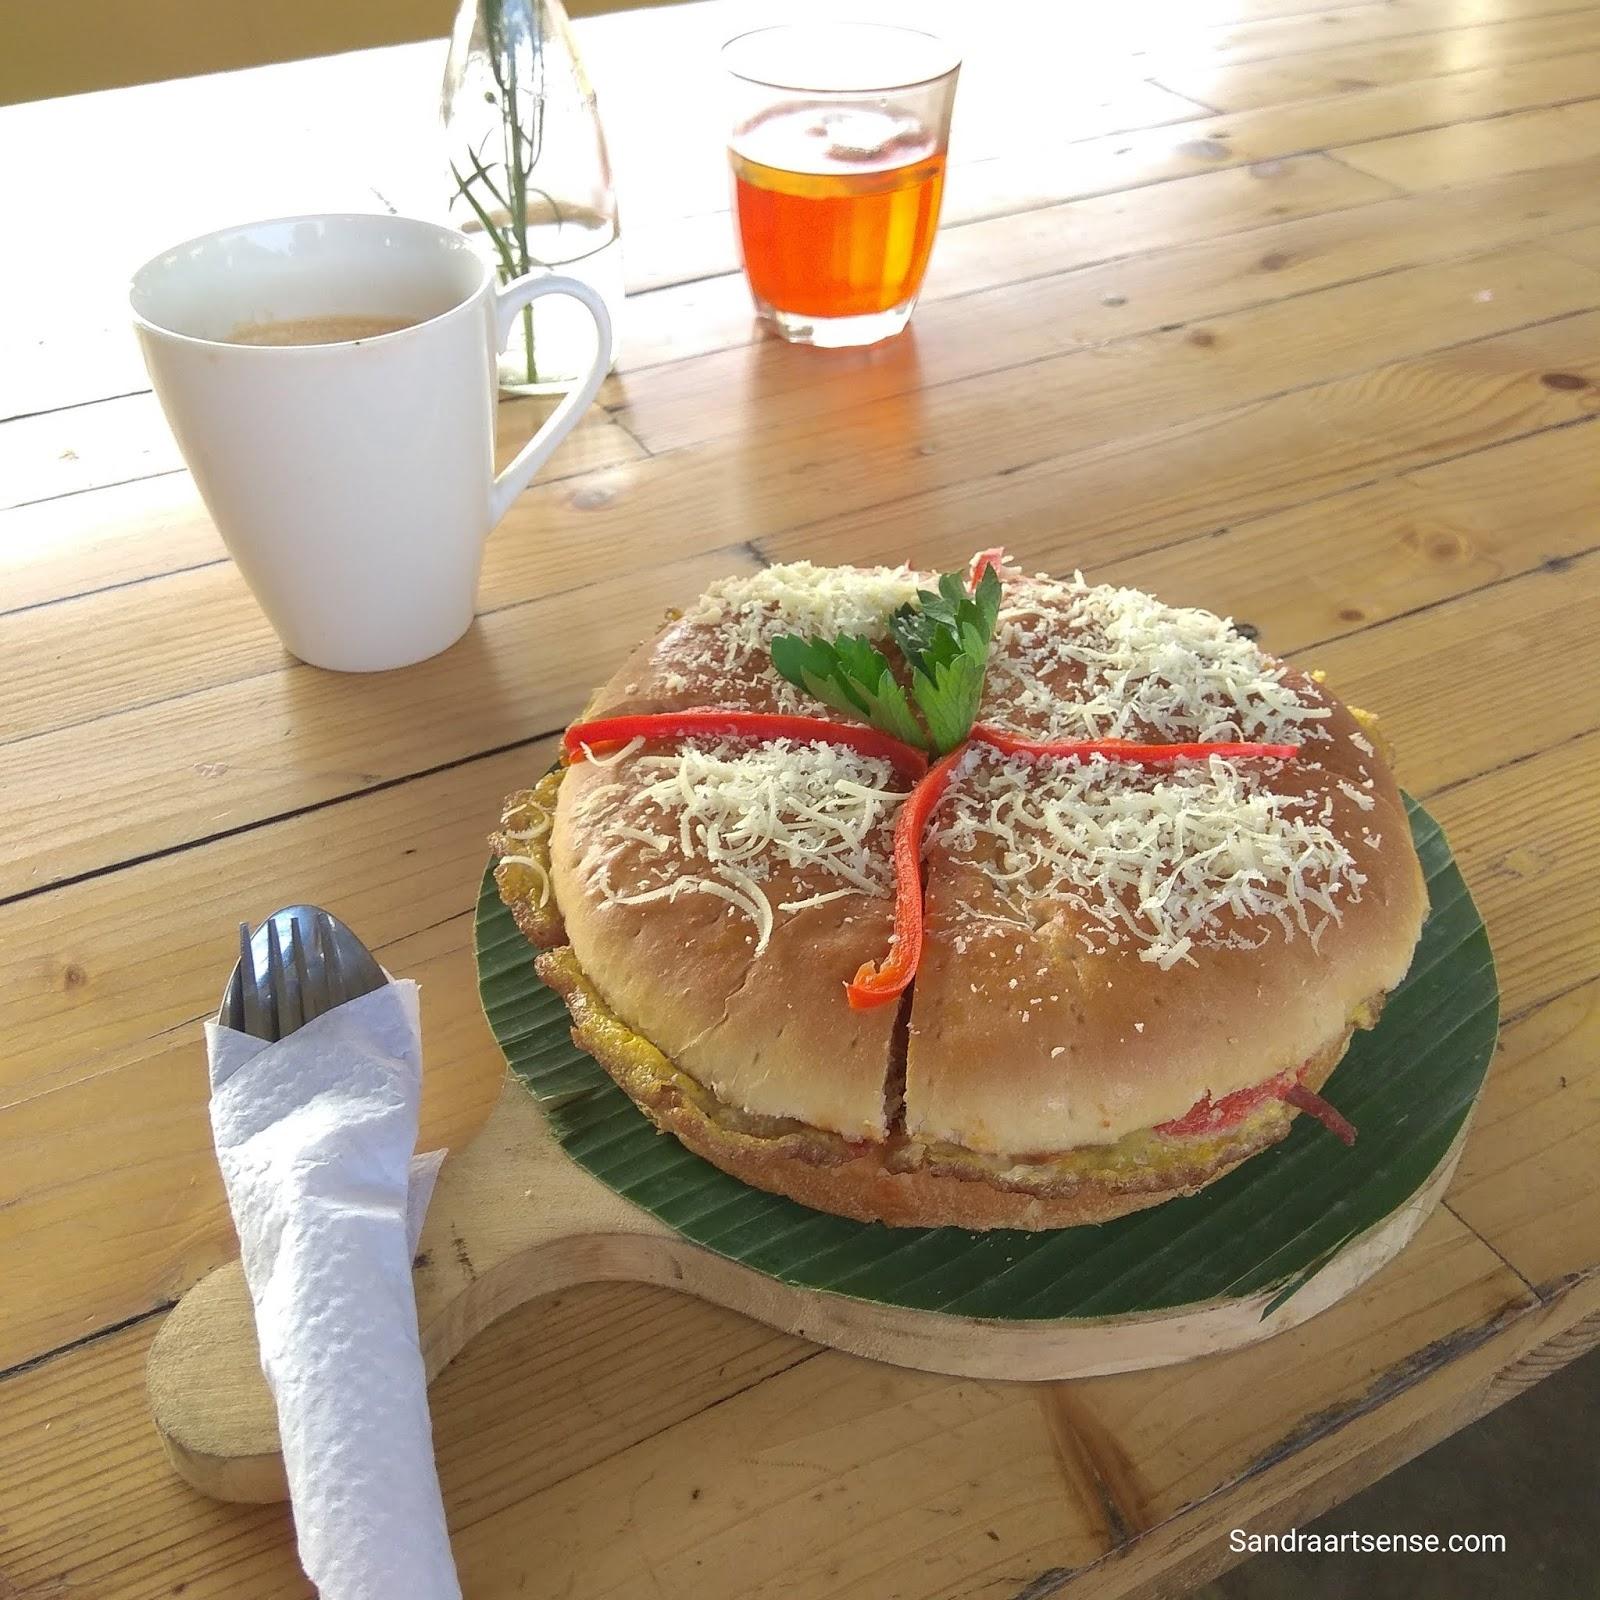 Sandraartsense Com Meloh Cafe Tent Ngemil Asyik Ditemani